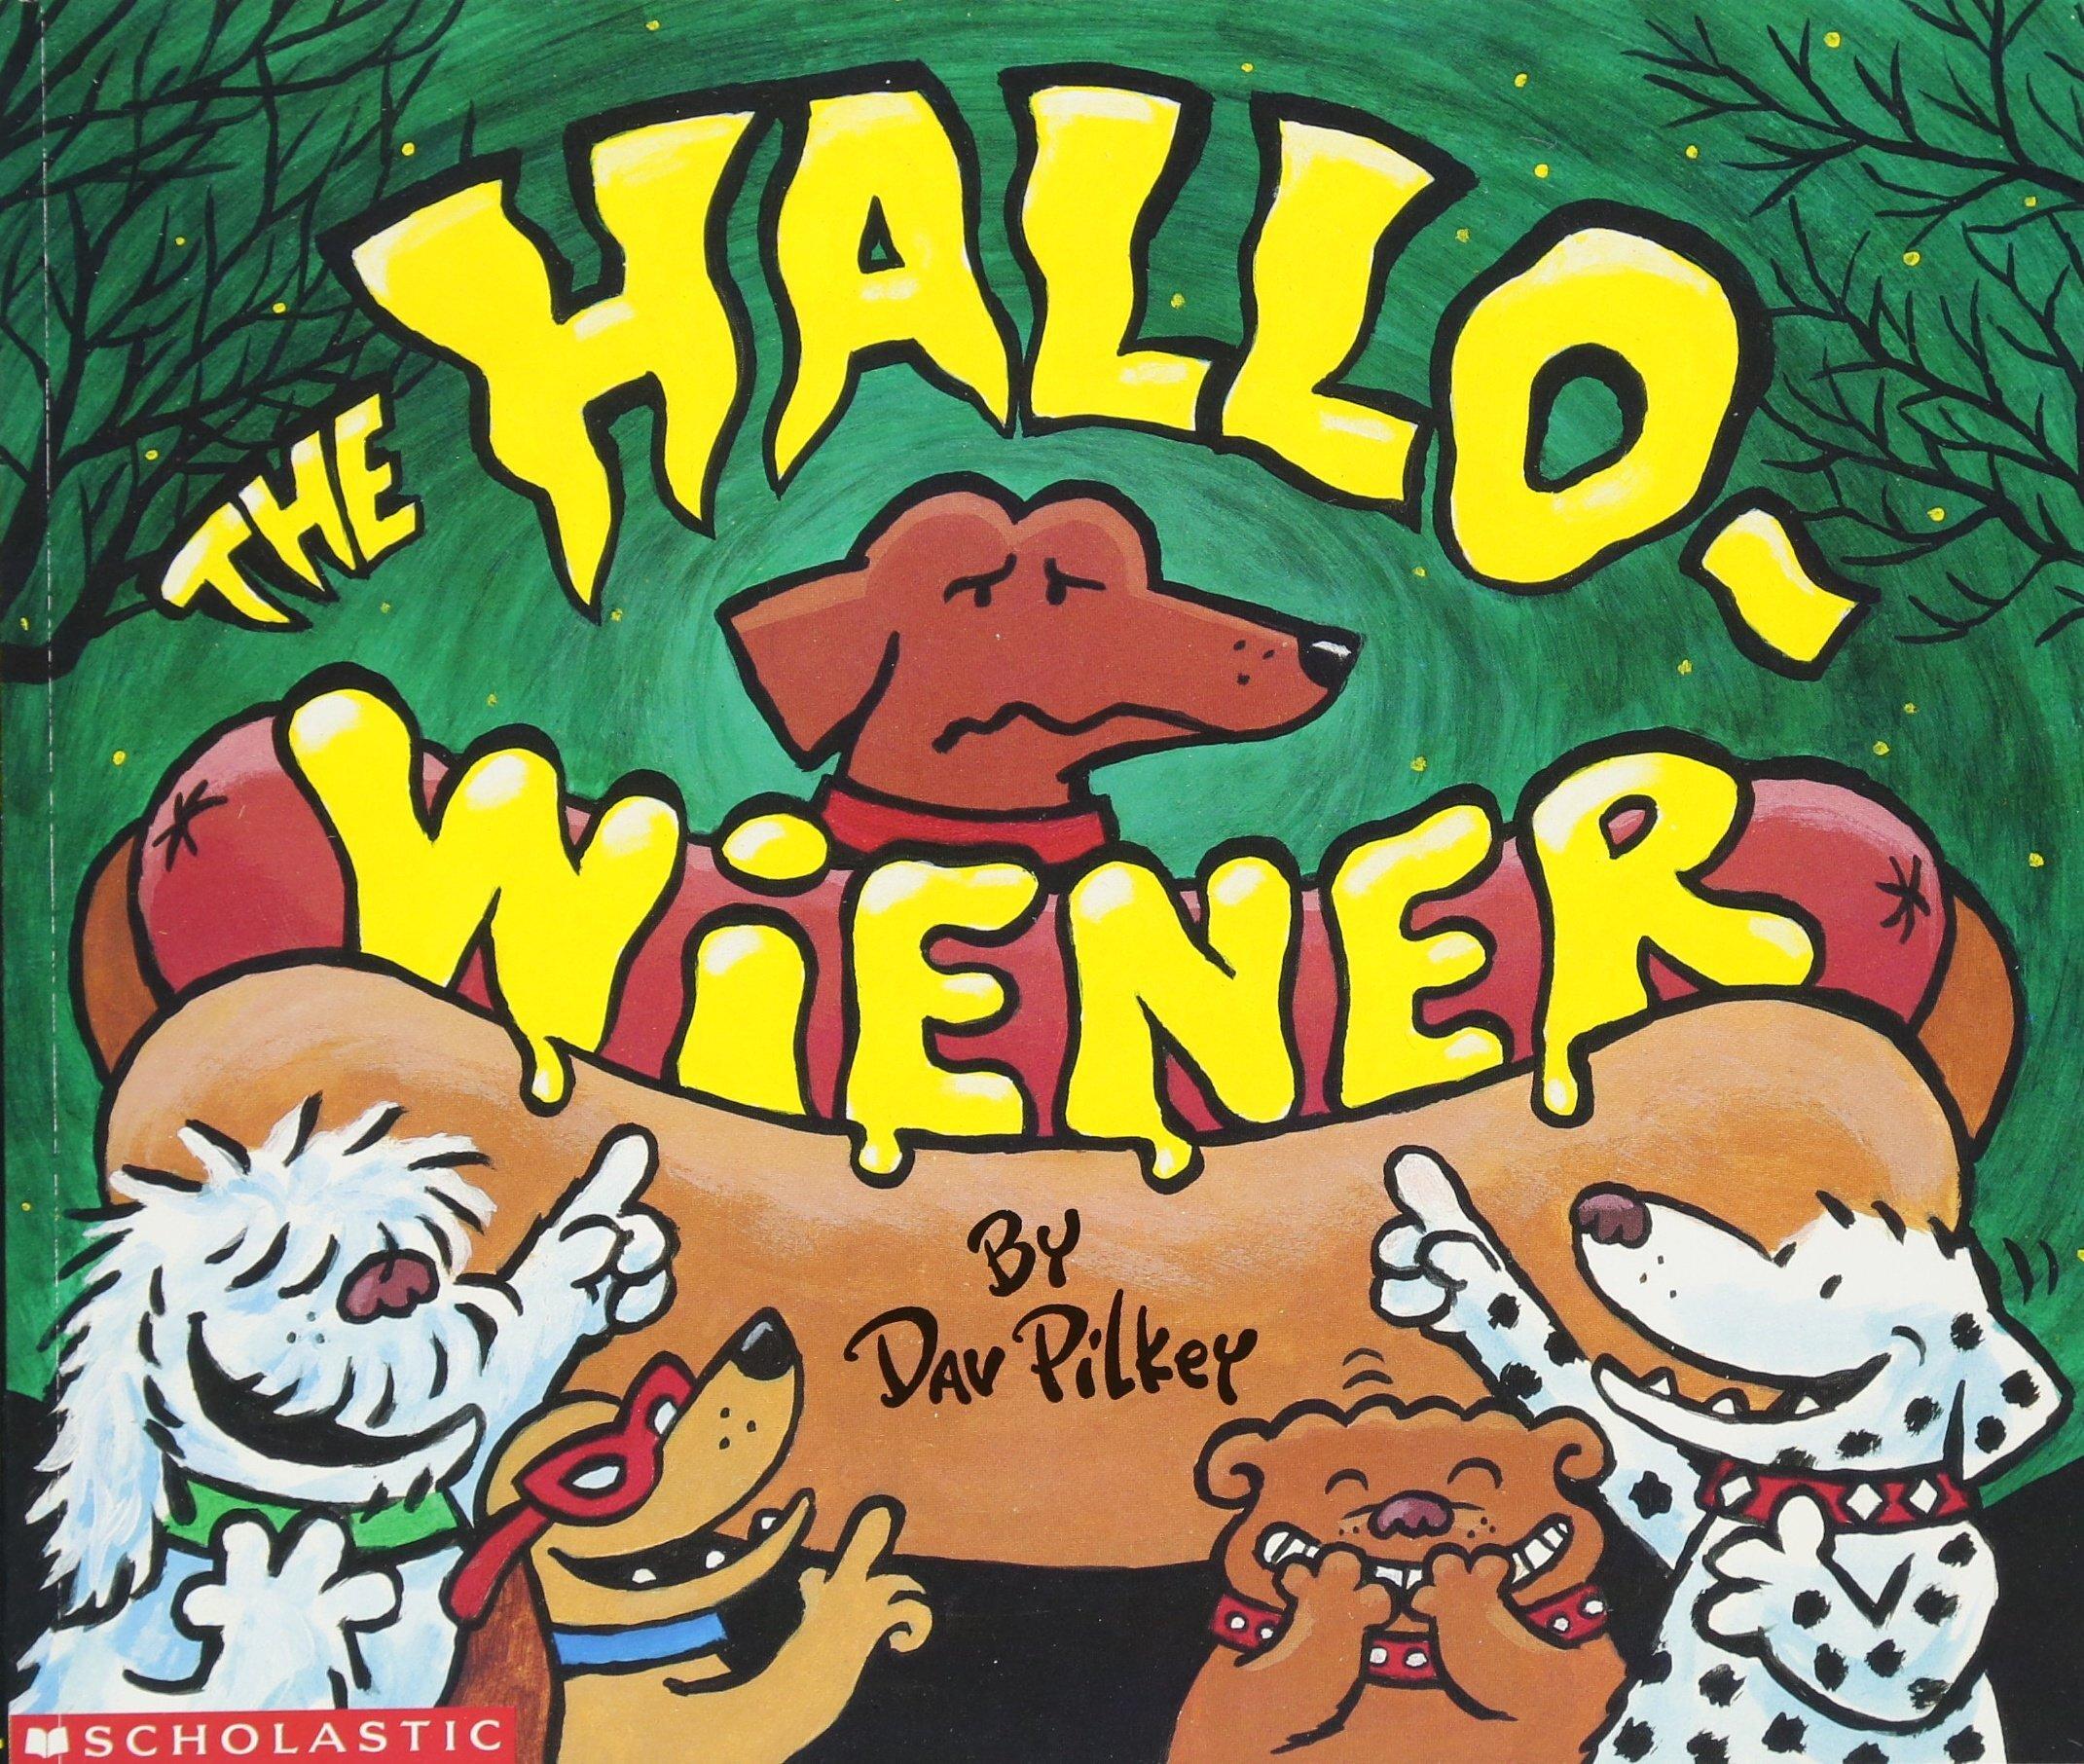 The Best Halloween Picture Books - The Hallo-Wiener.jpg